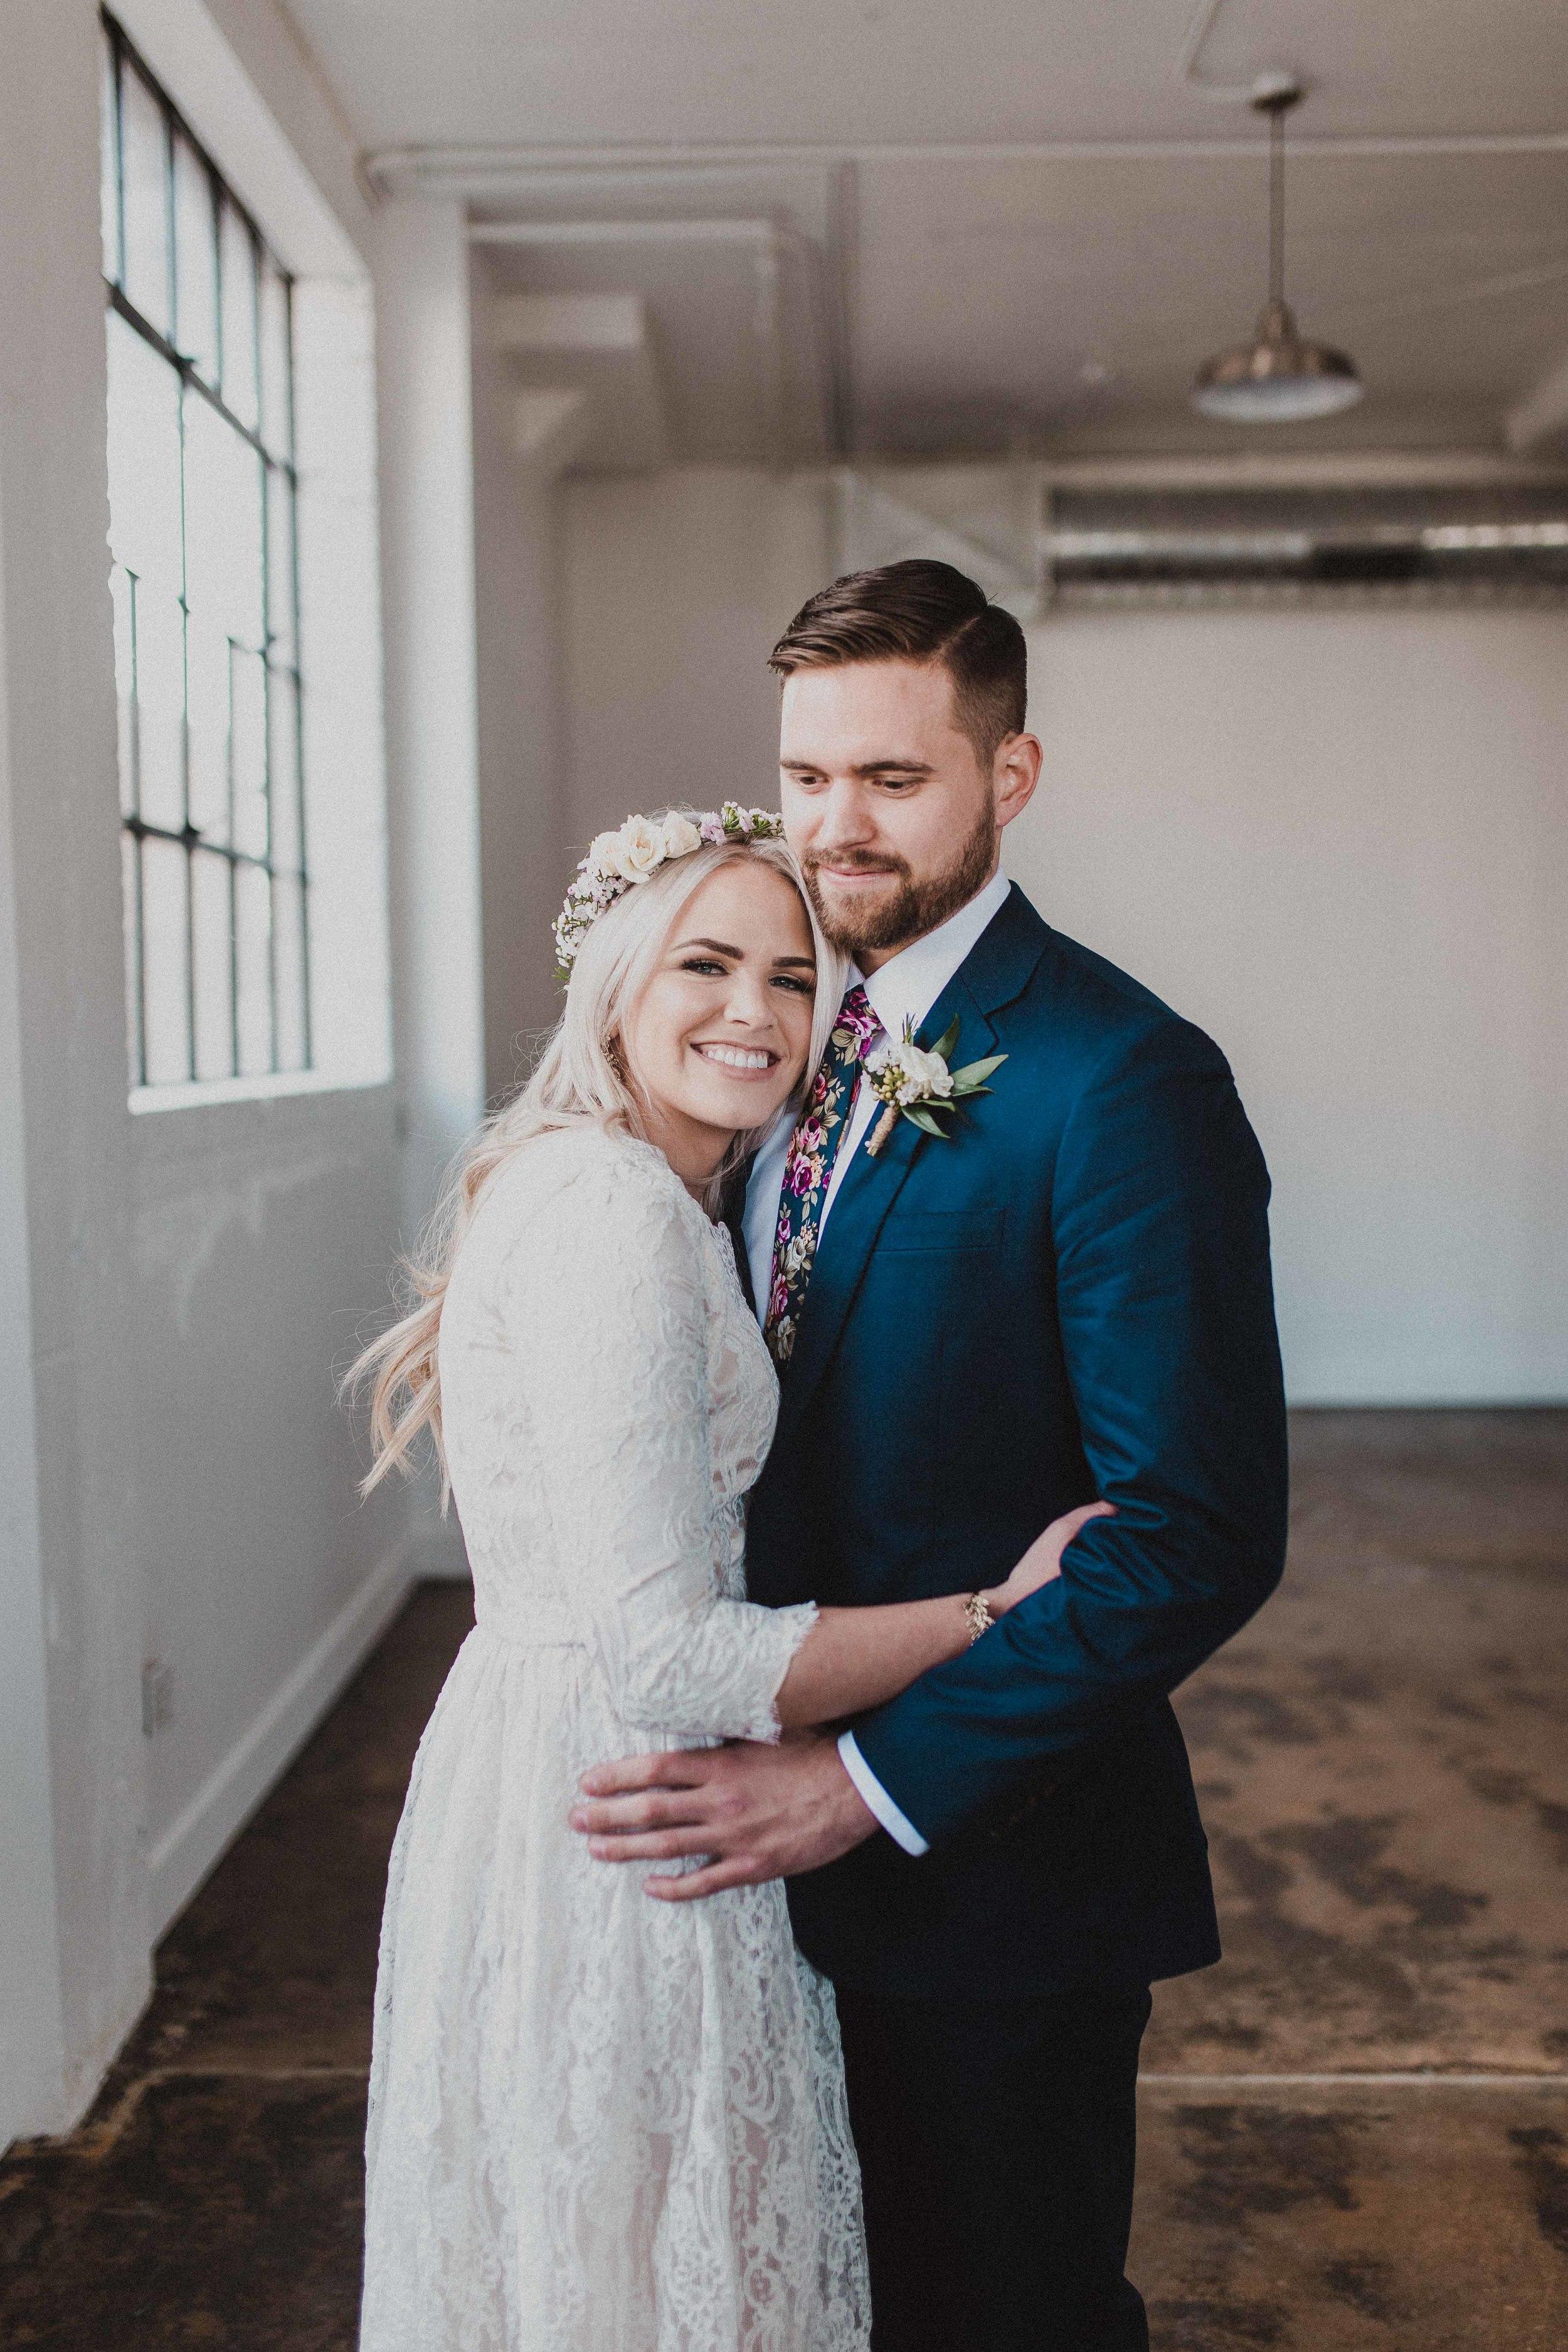 Salt-Lake-City-Wedding-Photographer-3.jpg